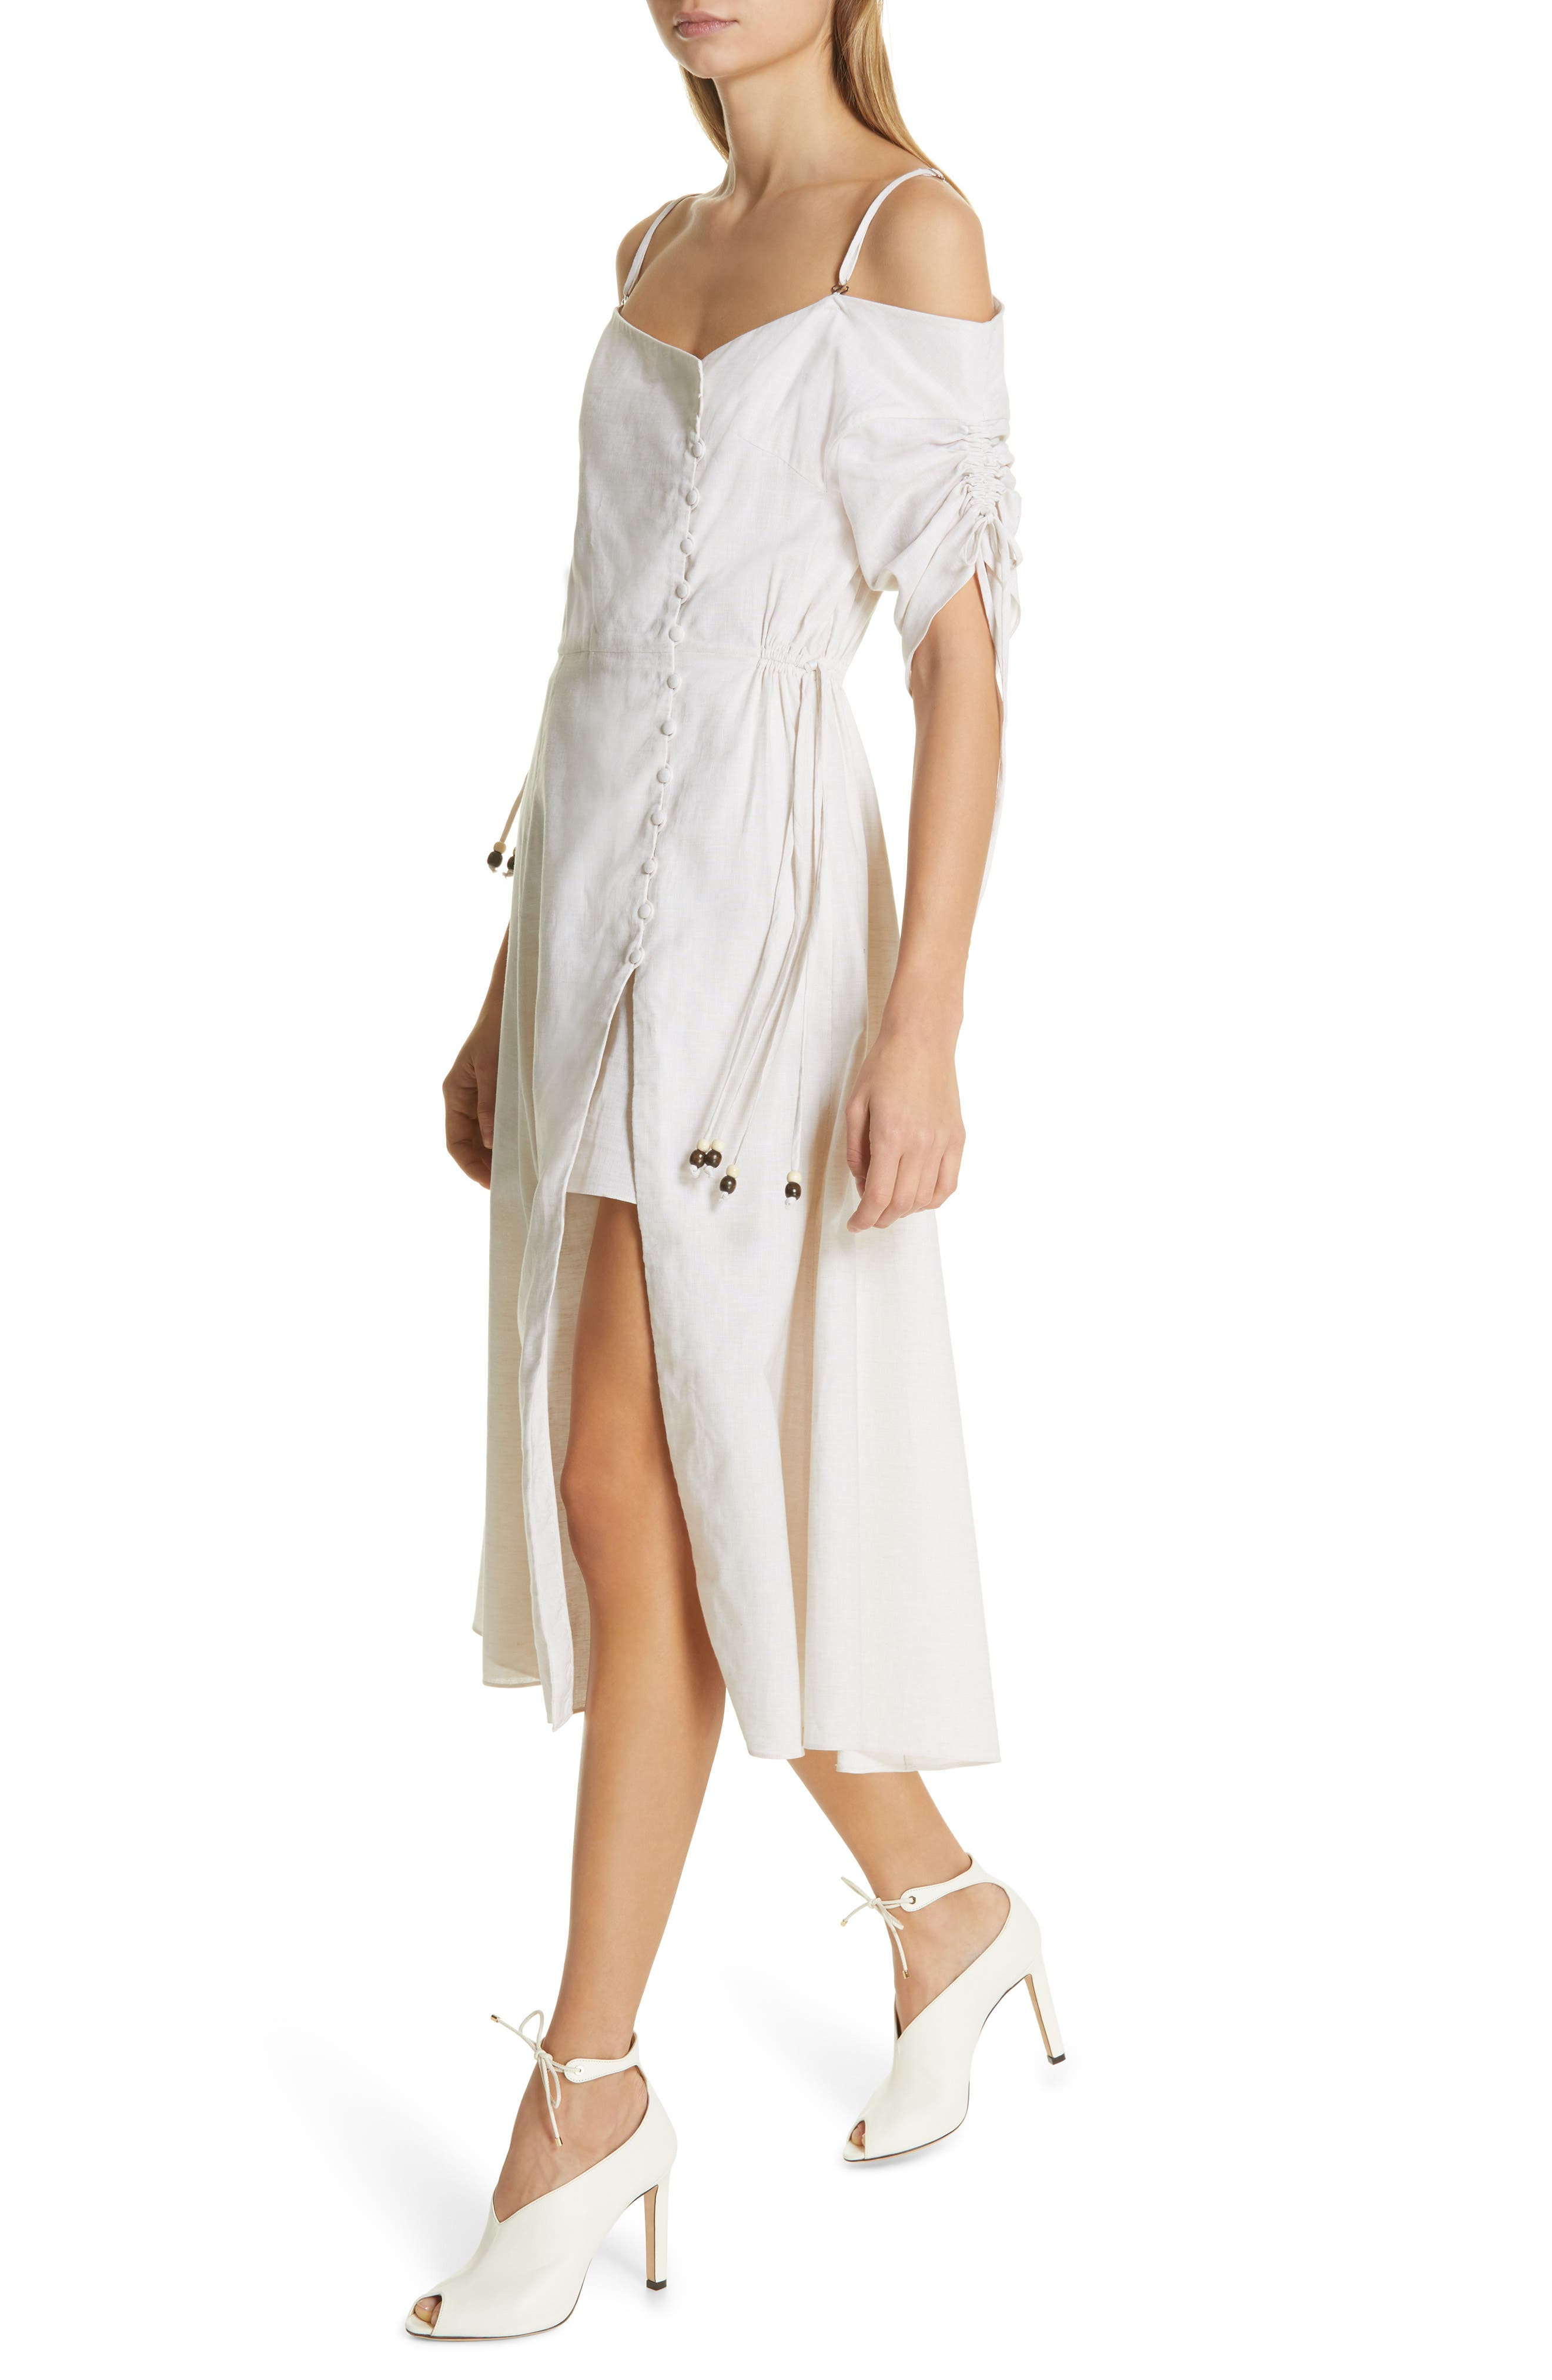 JONATHAN SIMKHAI,                             Off the Shoulder Cotton & Linen Dress,                             Alternate thumbnail 4, color,                             ECRU